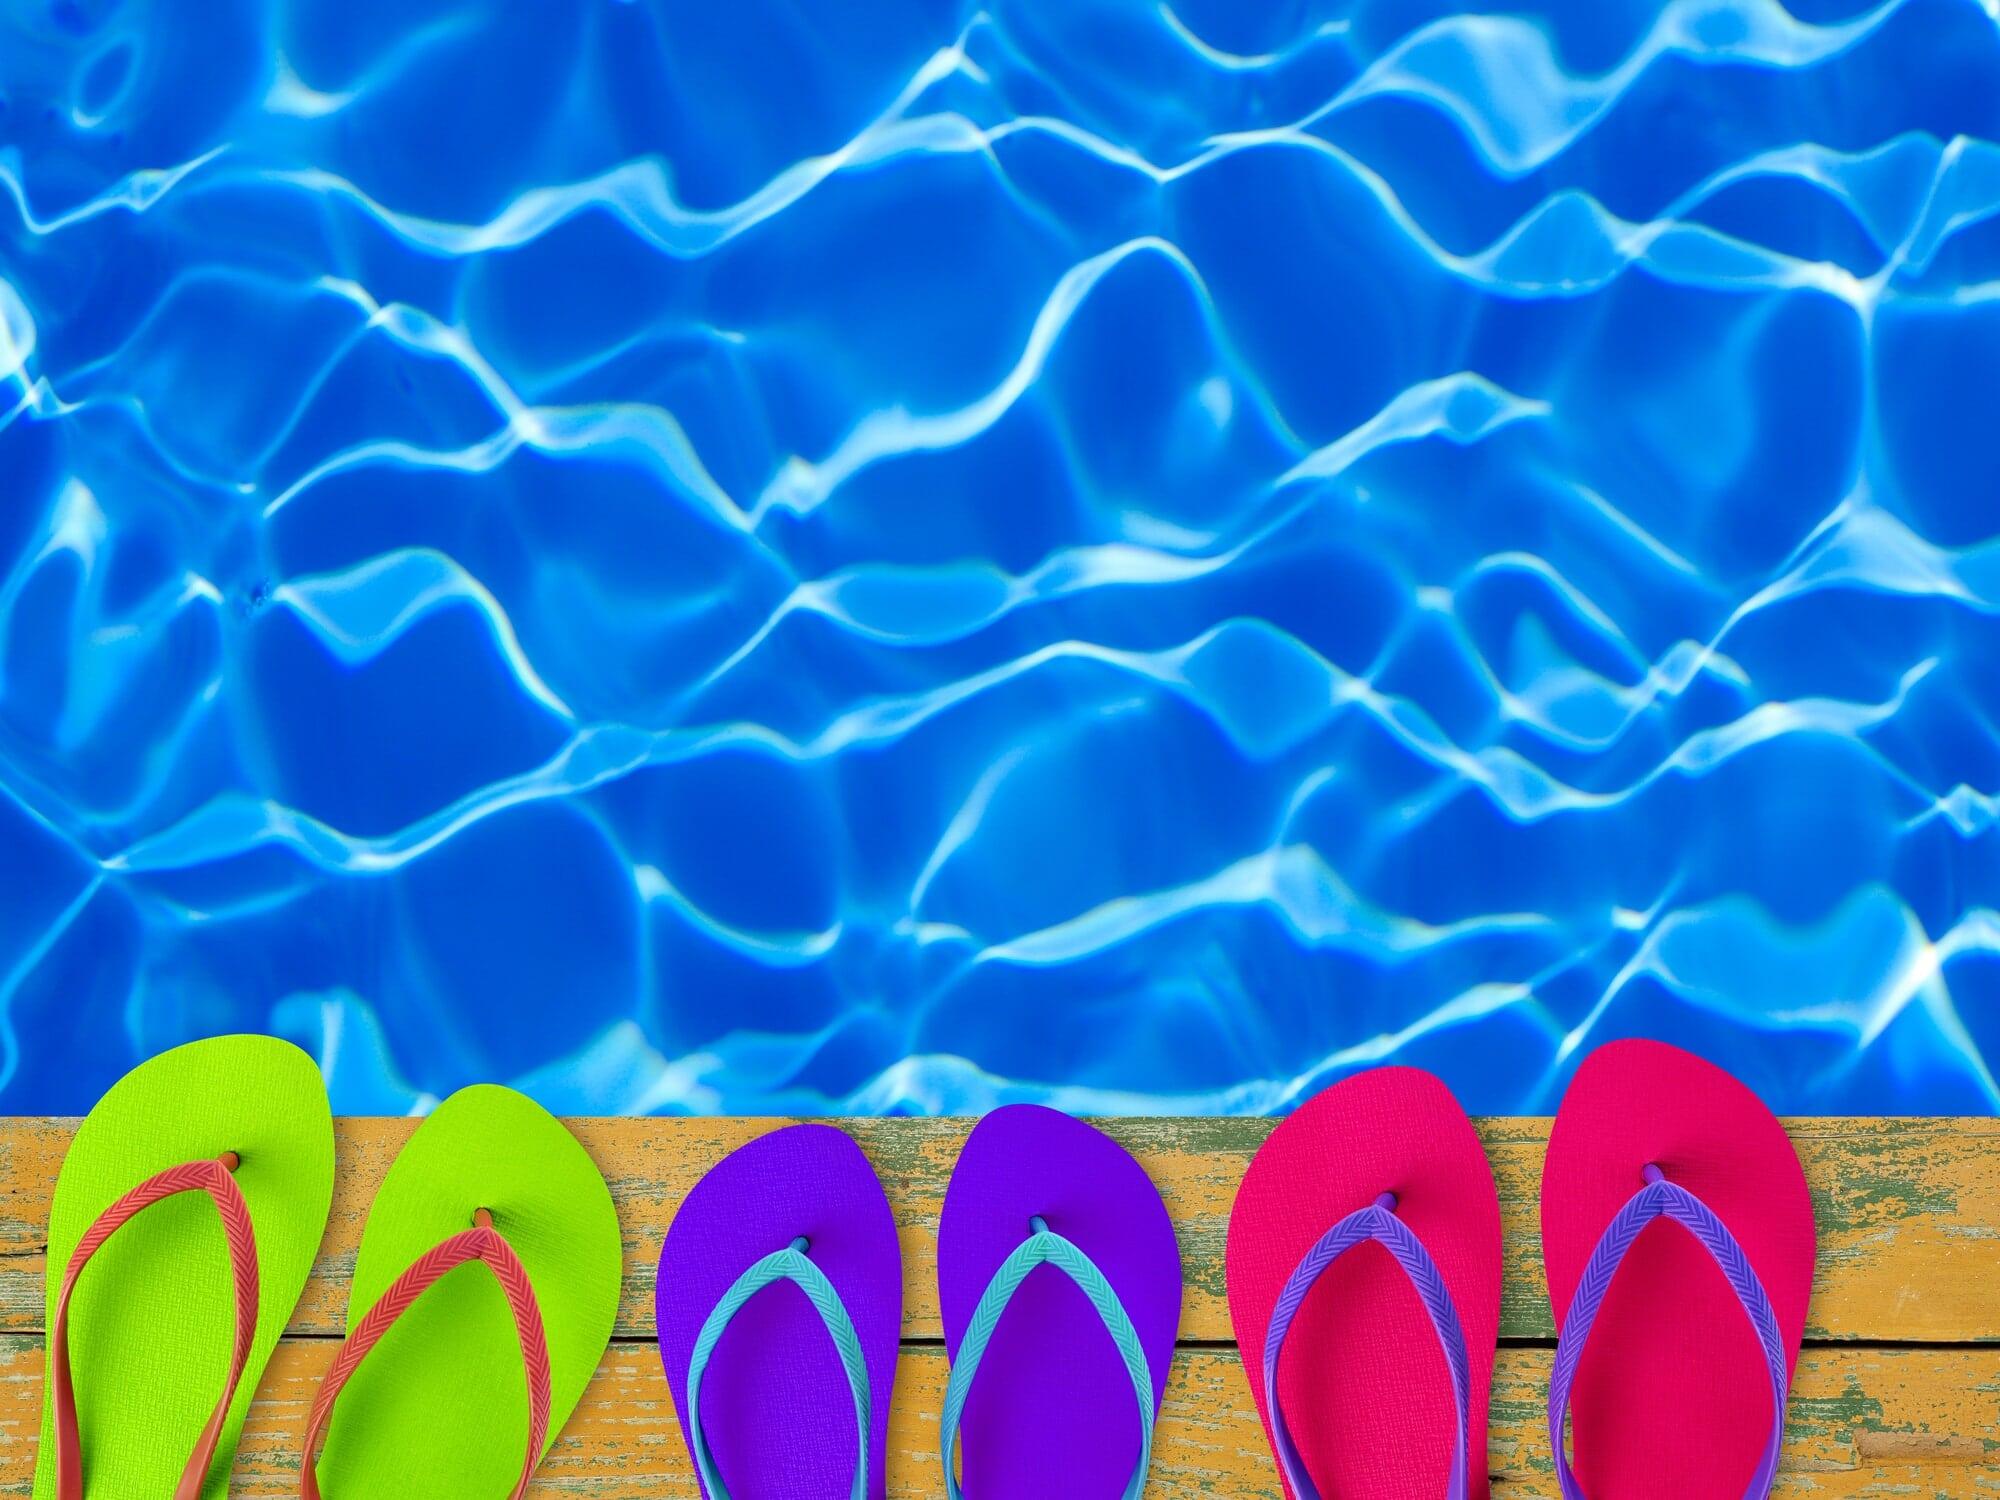 Paradise Pools and Spas of Illinois, Inc. image 7